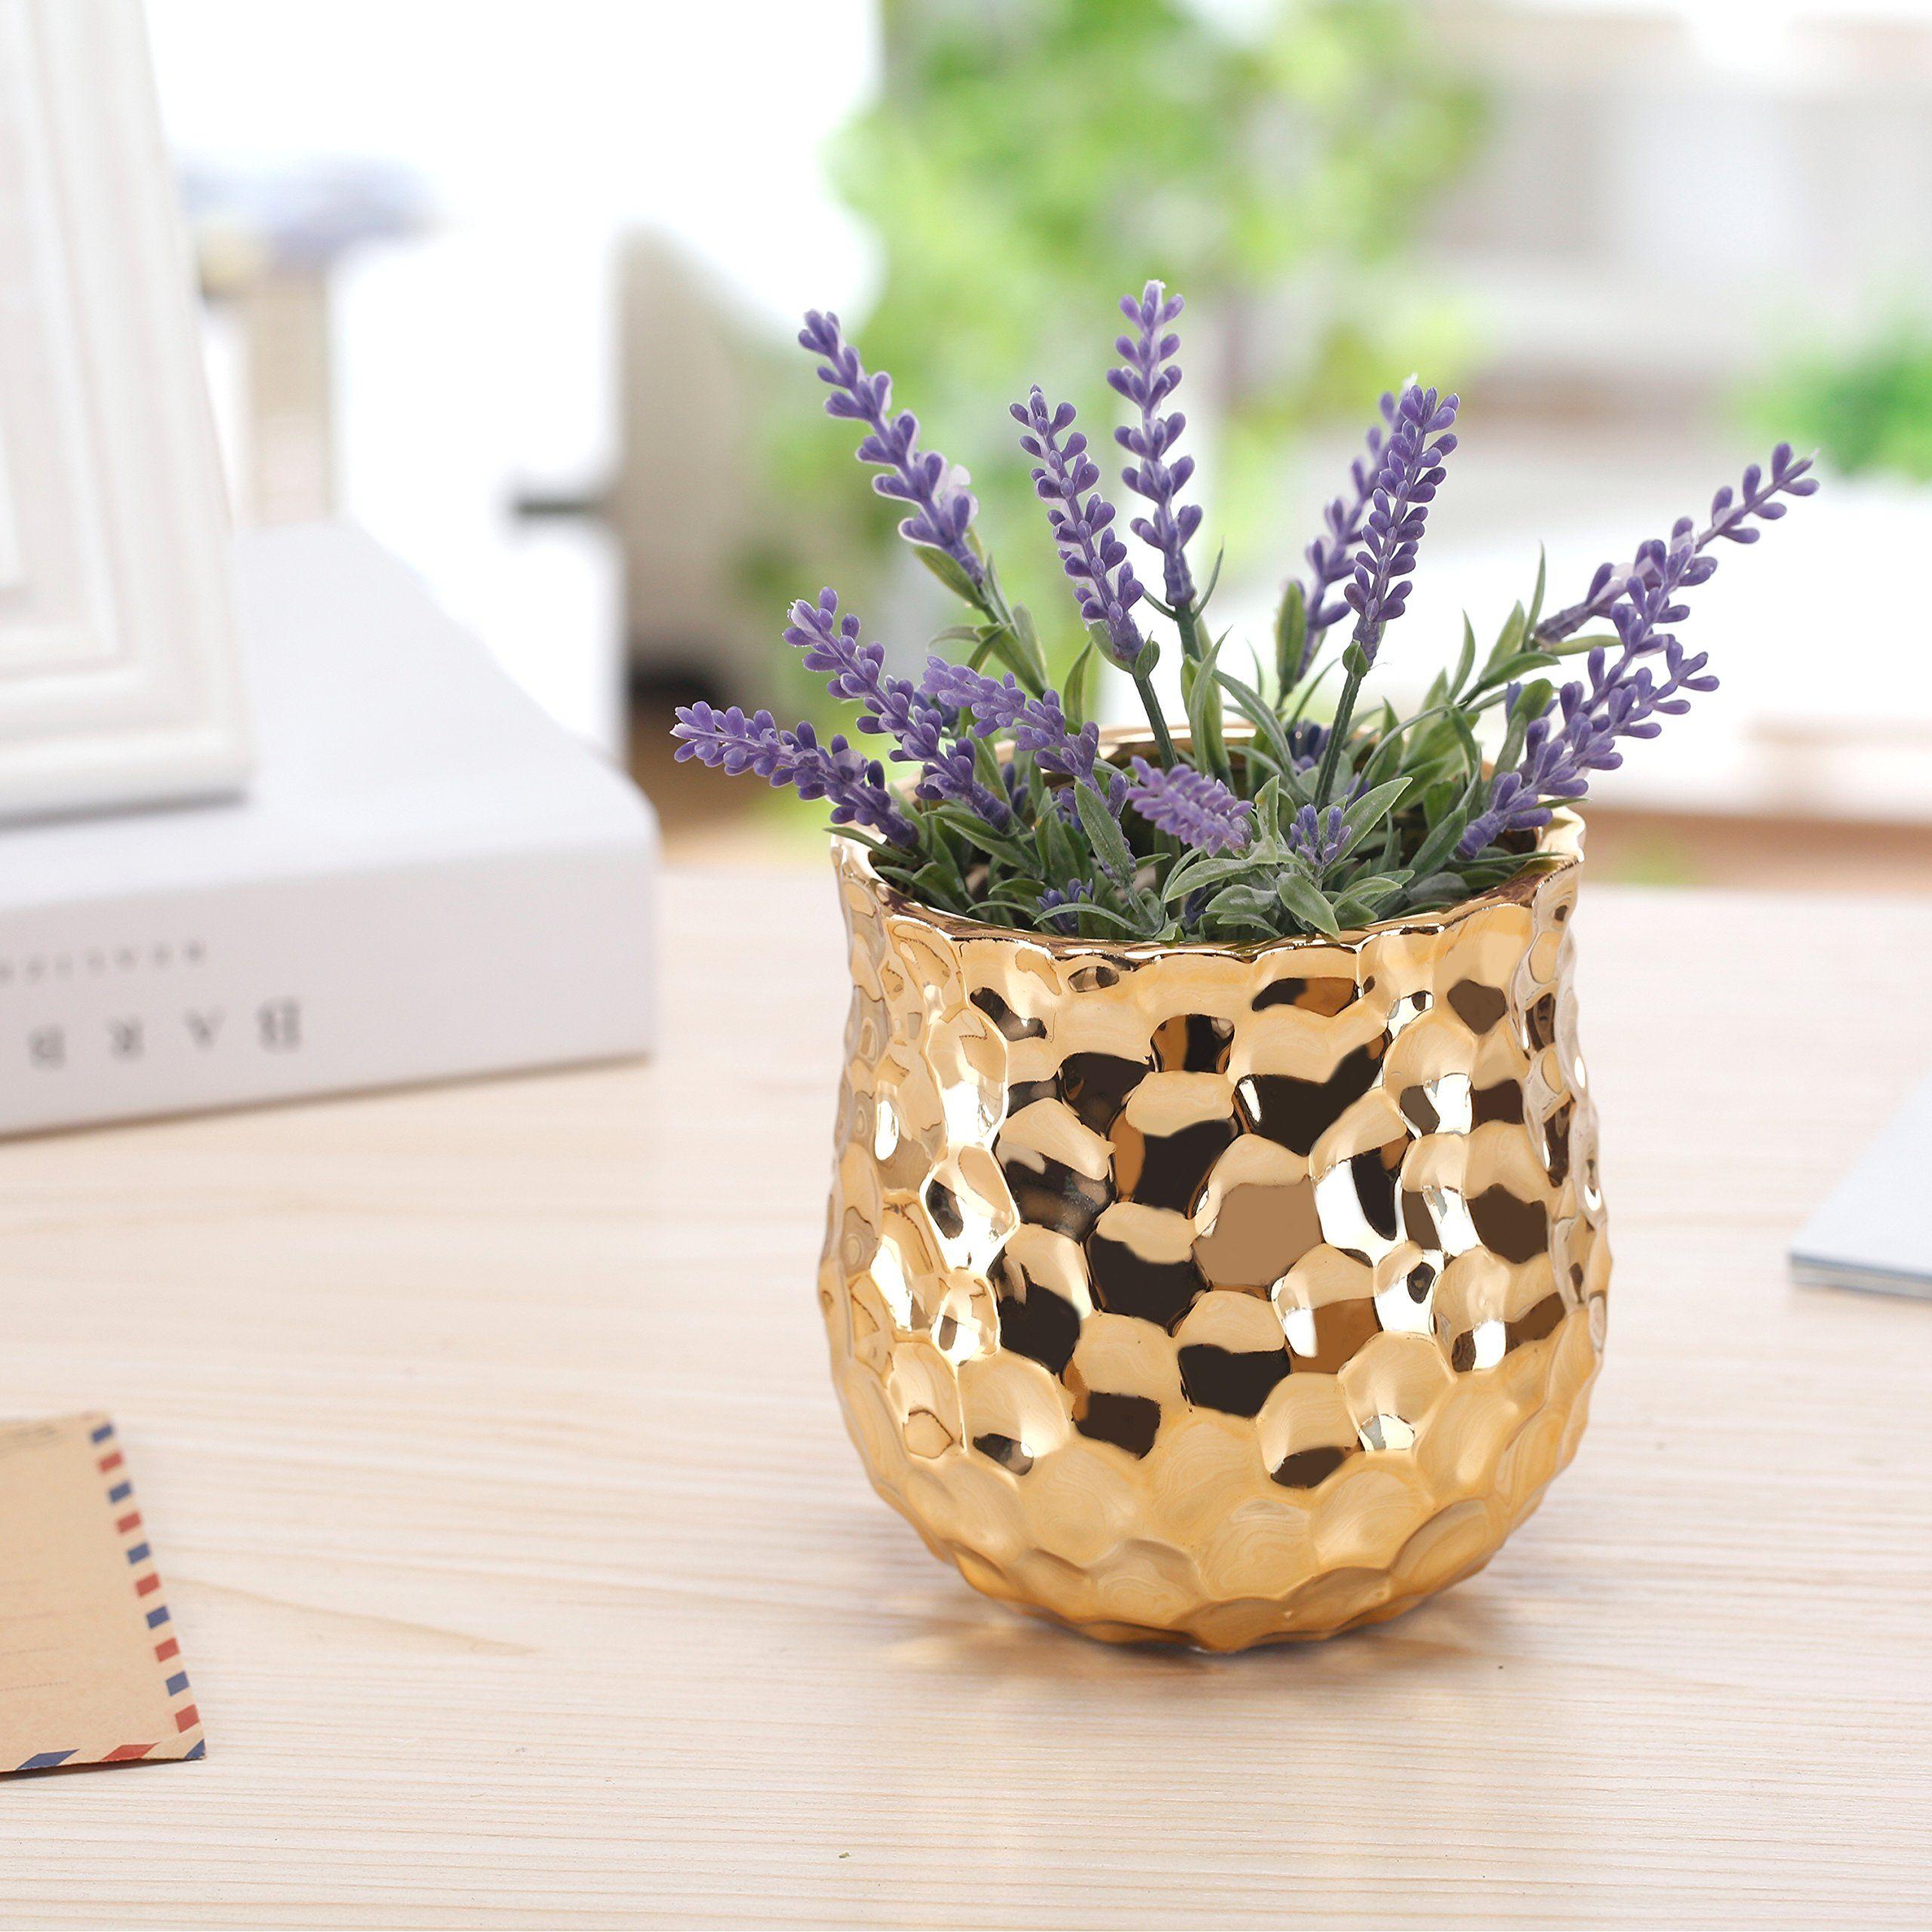 4inch ceramic flower plant vase with metallic goldtone